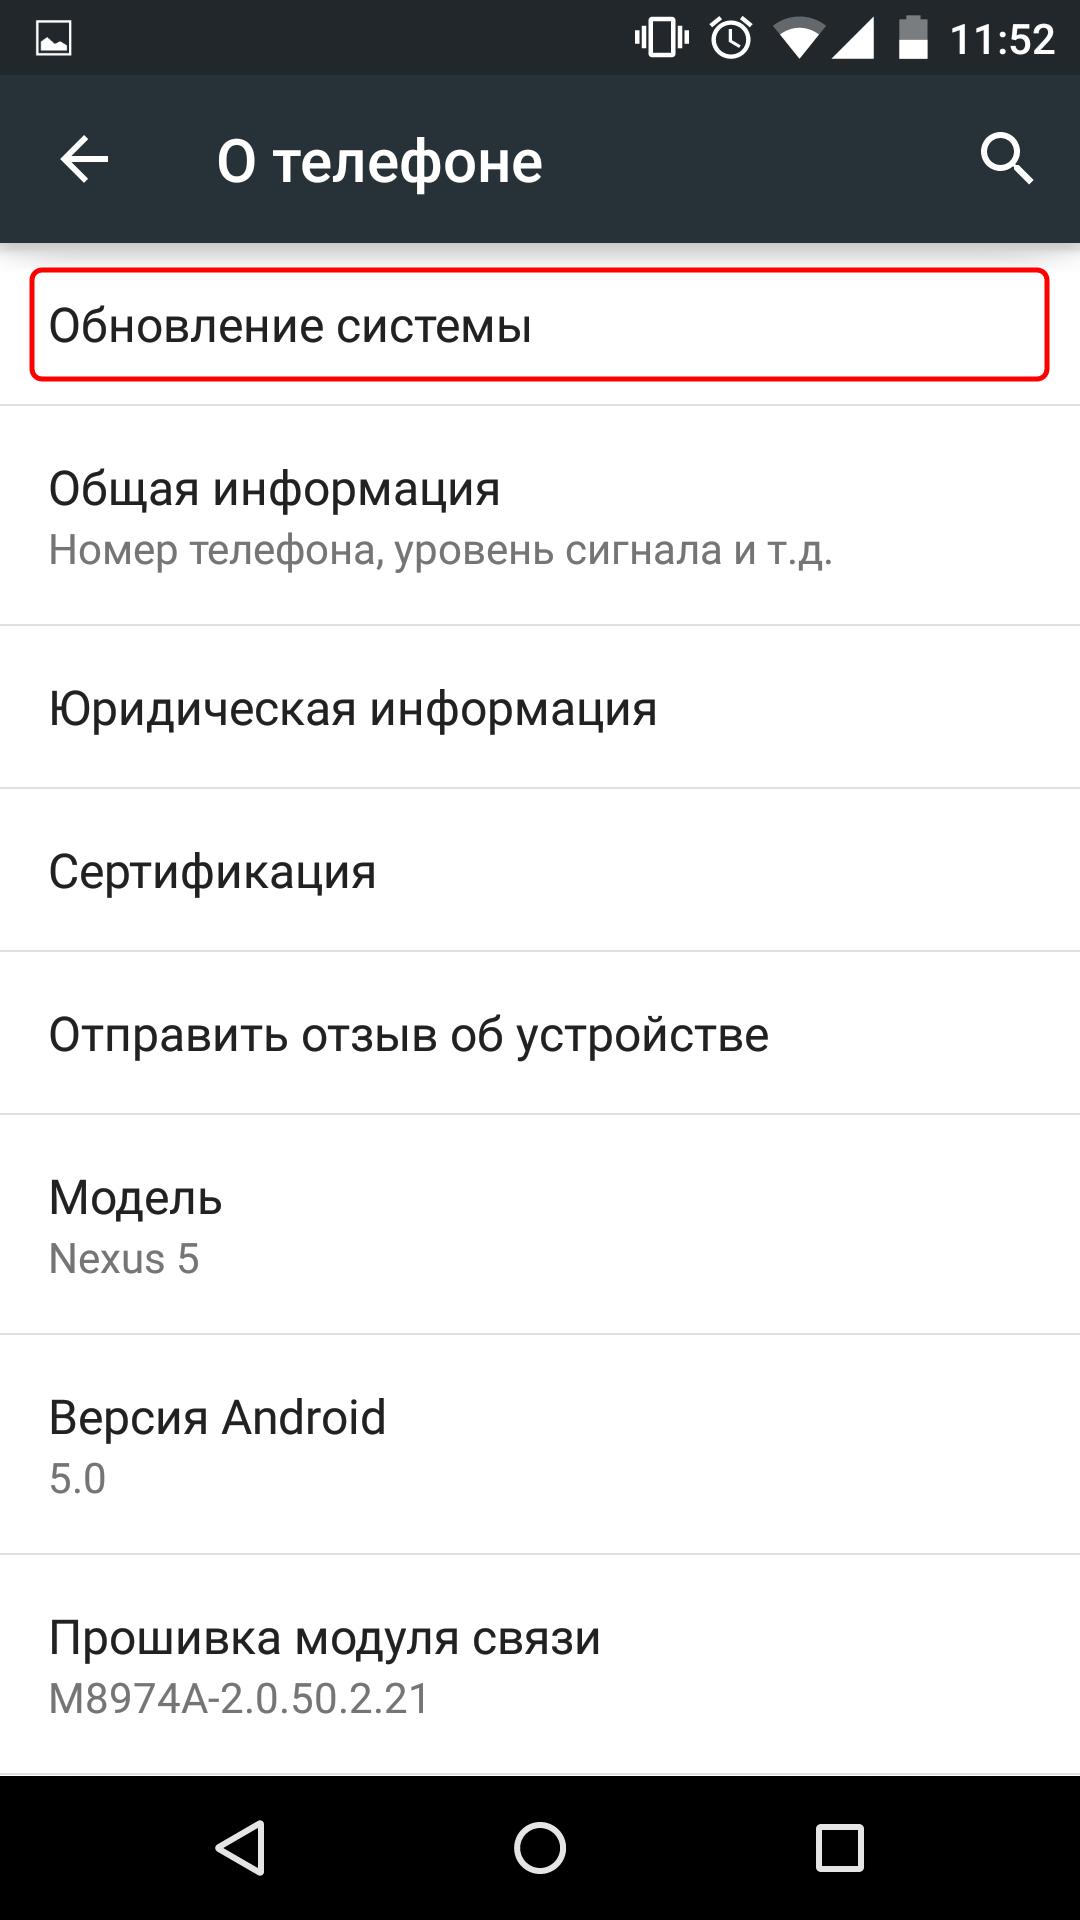 Xiaomi - это просто   Твой Xiaomi   ВКонтакте